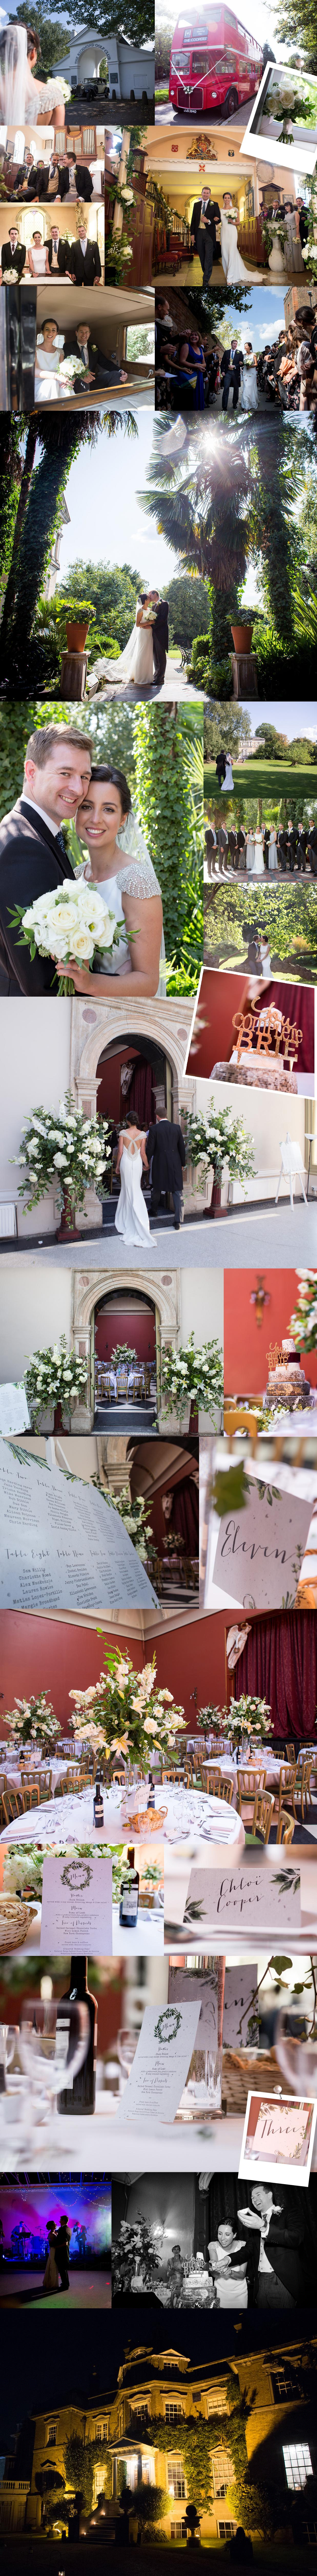 Botanical wedding at Hampton Court House